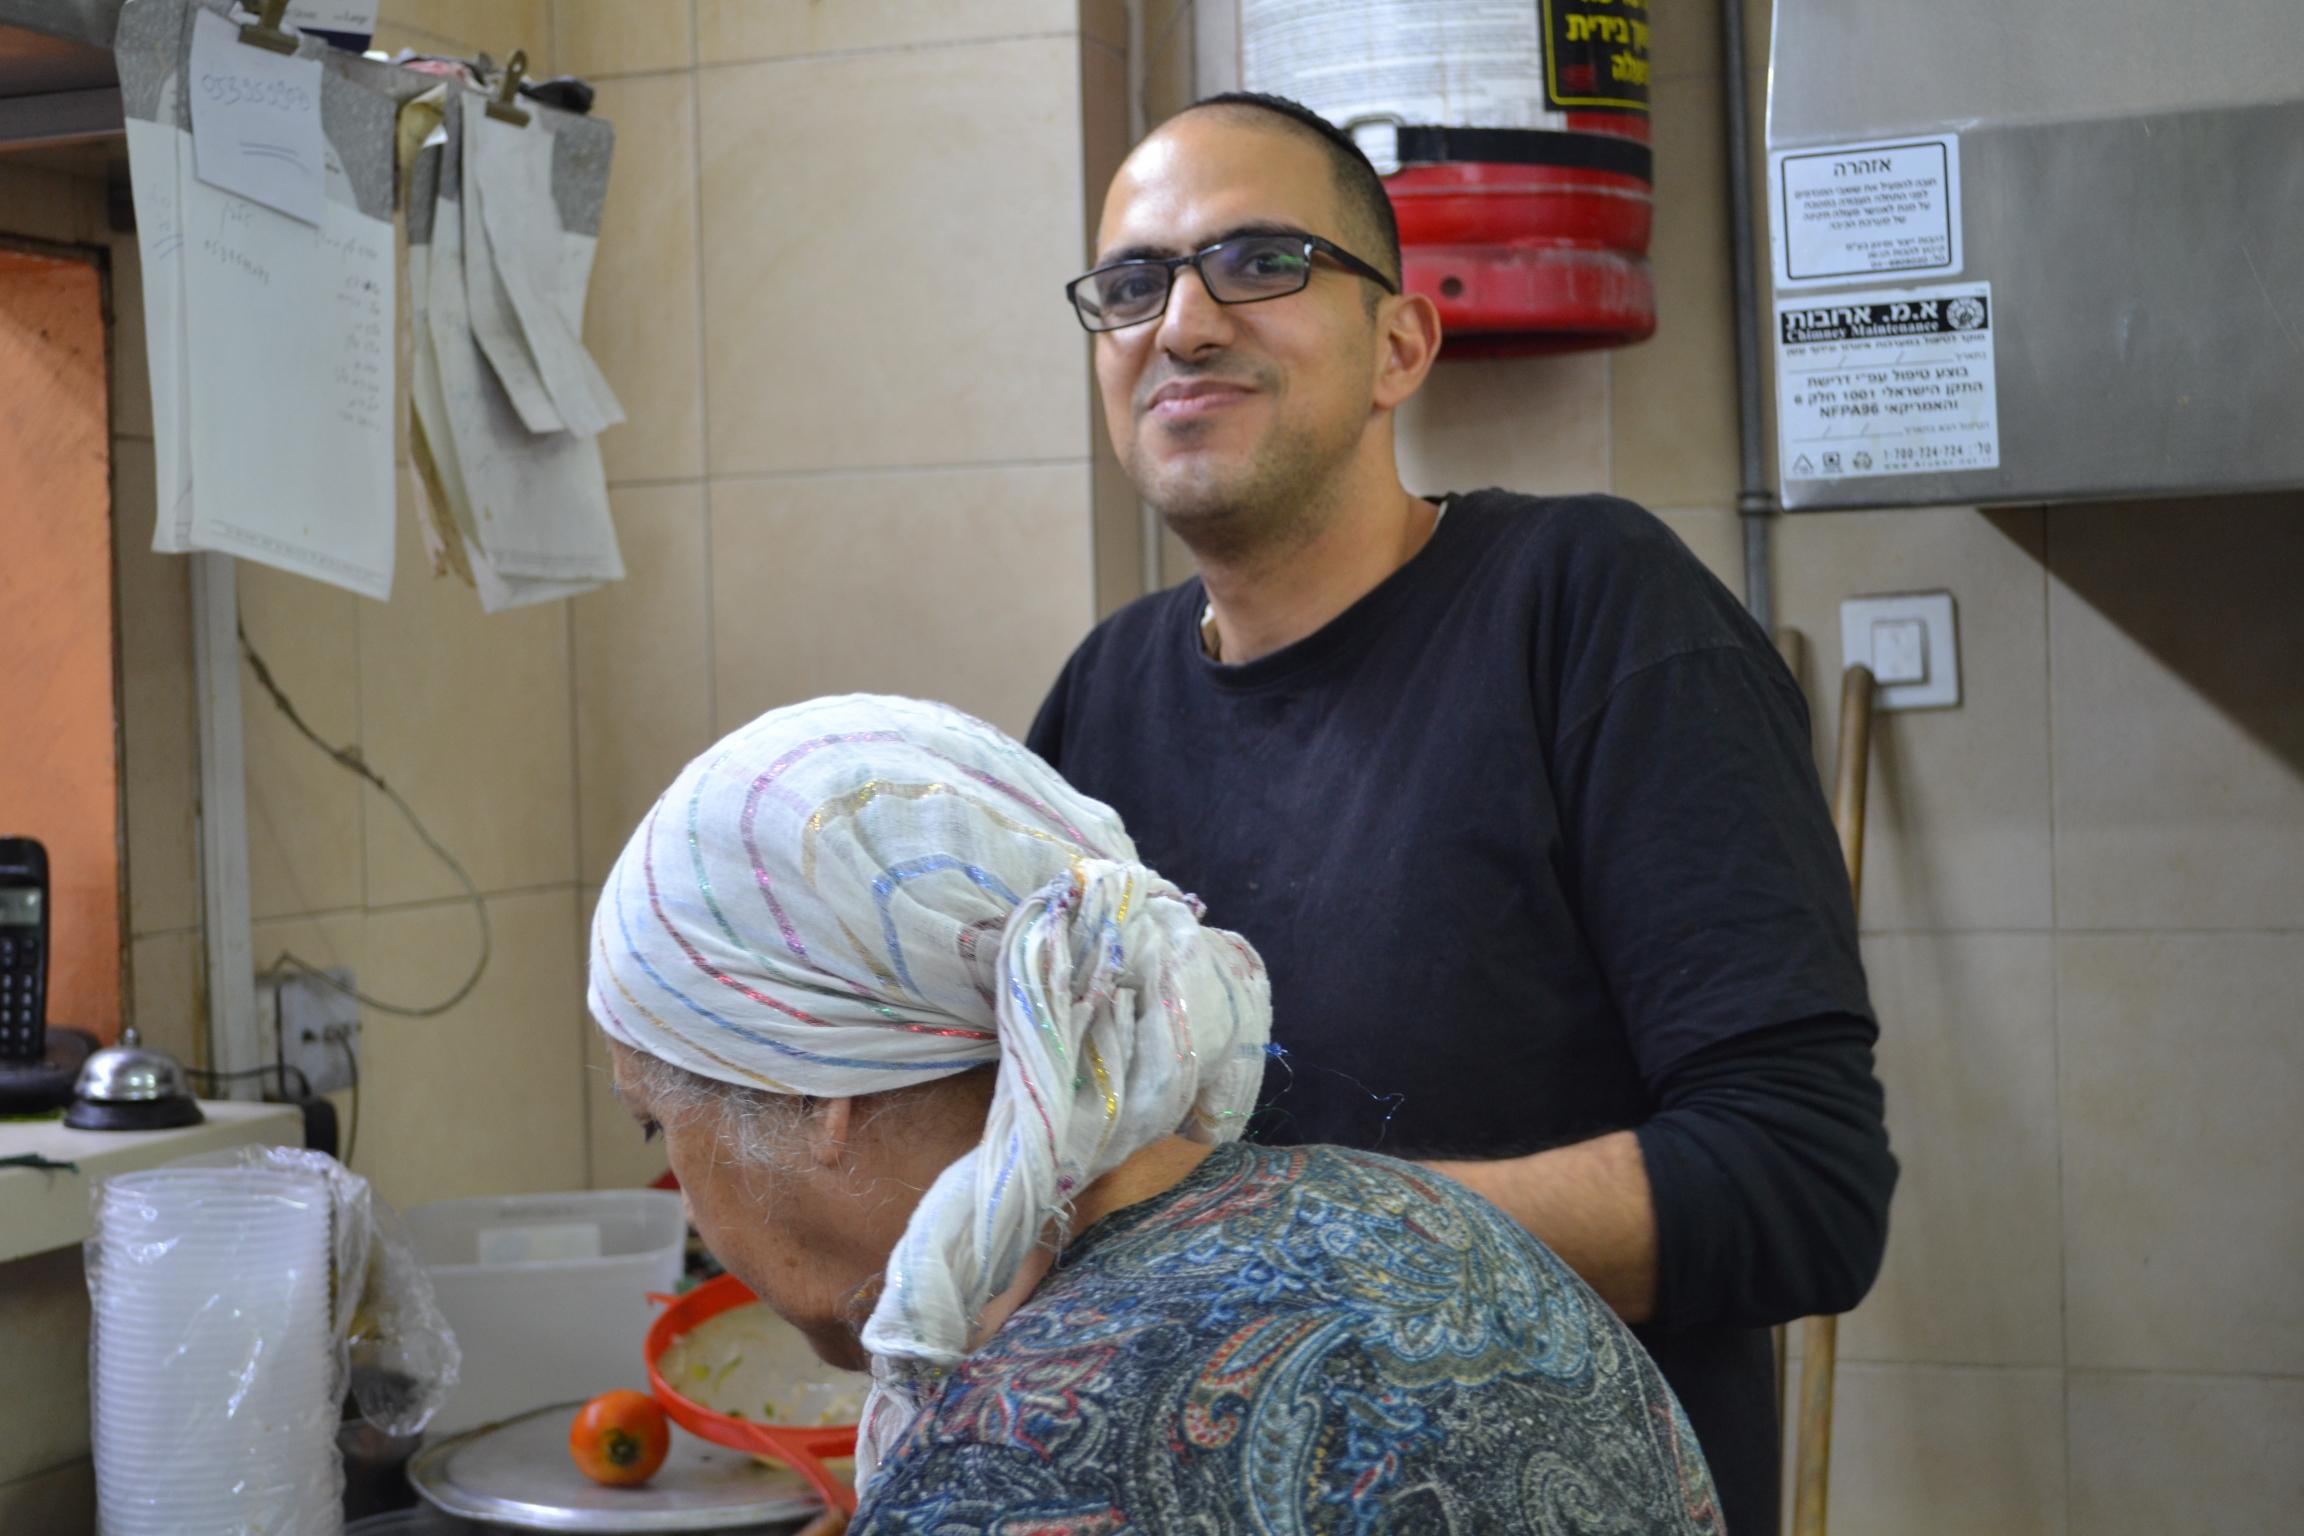 Avi Hanasav with his mother Moluk Hanasav at Shamshiri, the Persian restaurant they own together in Tel Aviv, Israel.